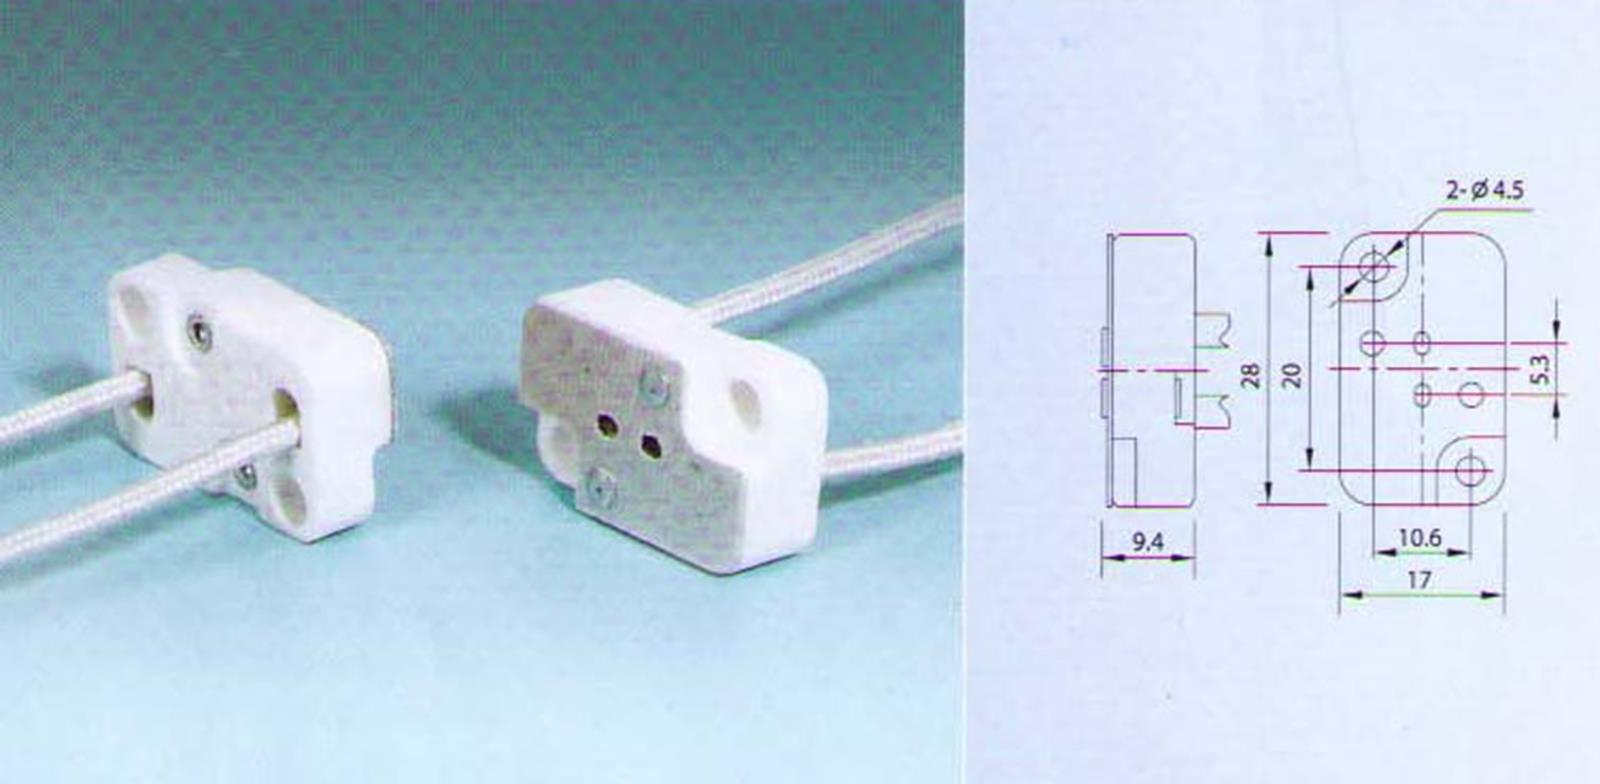 10 Qty. Divine Lighting Square Multi-base Socket Lamp Holder G5.3 GX5.3 G6.35 GX6.35 Works With : ELC; BRL; 64514; EHJ; etc.